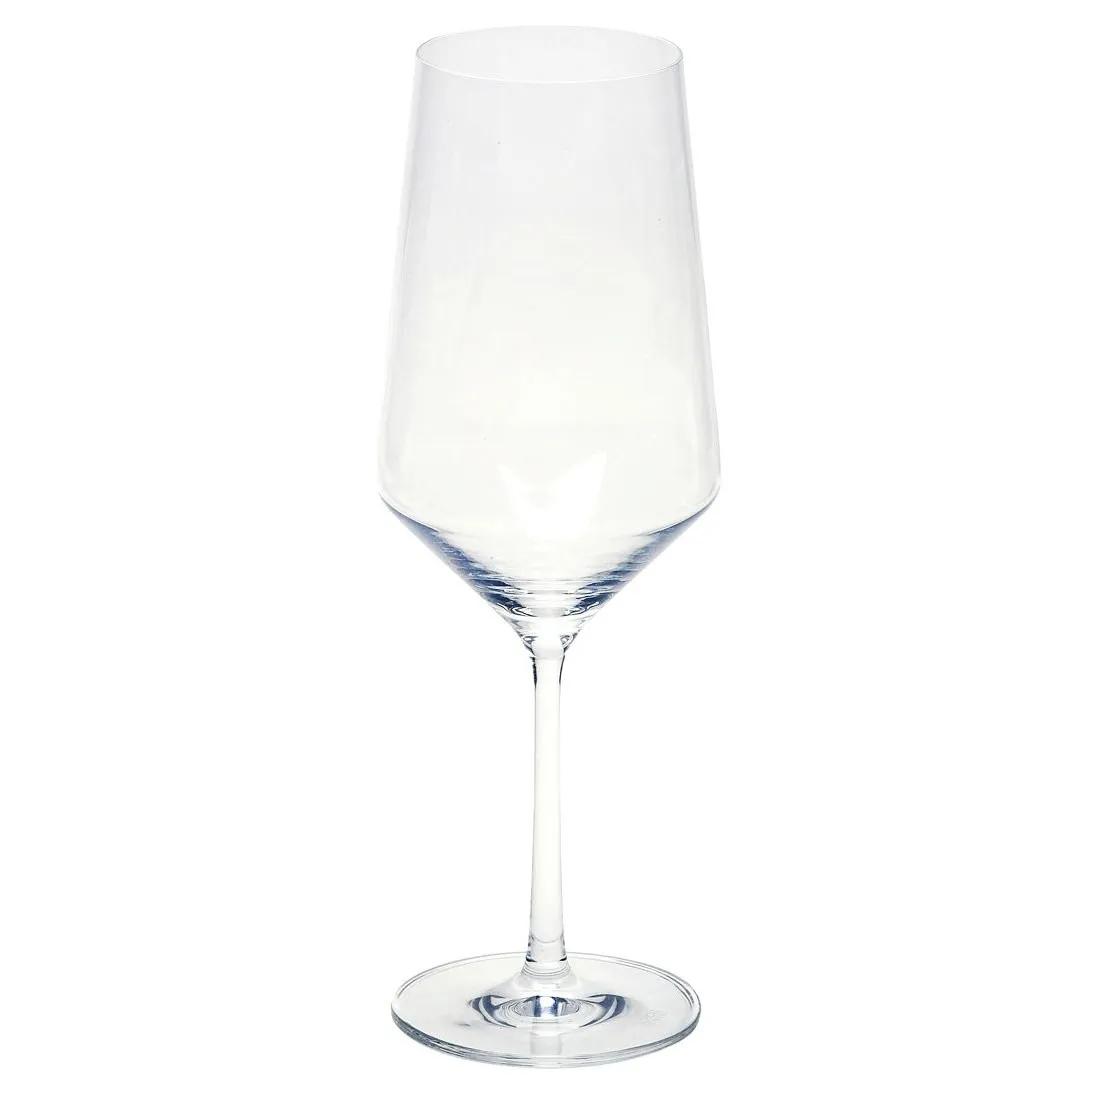 Conjunto De 06 Taças Bordeaux De Cristal Para Vinho 680 Ml Pure Schott Zwiesel